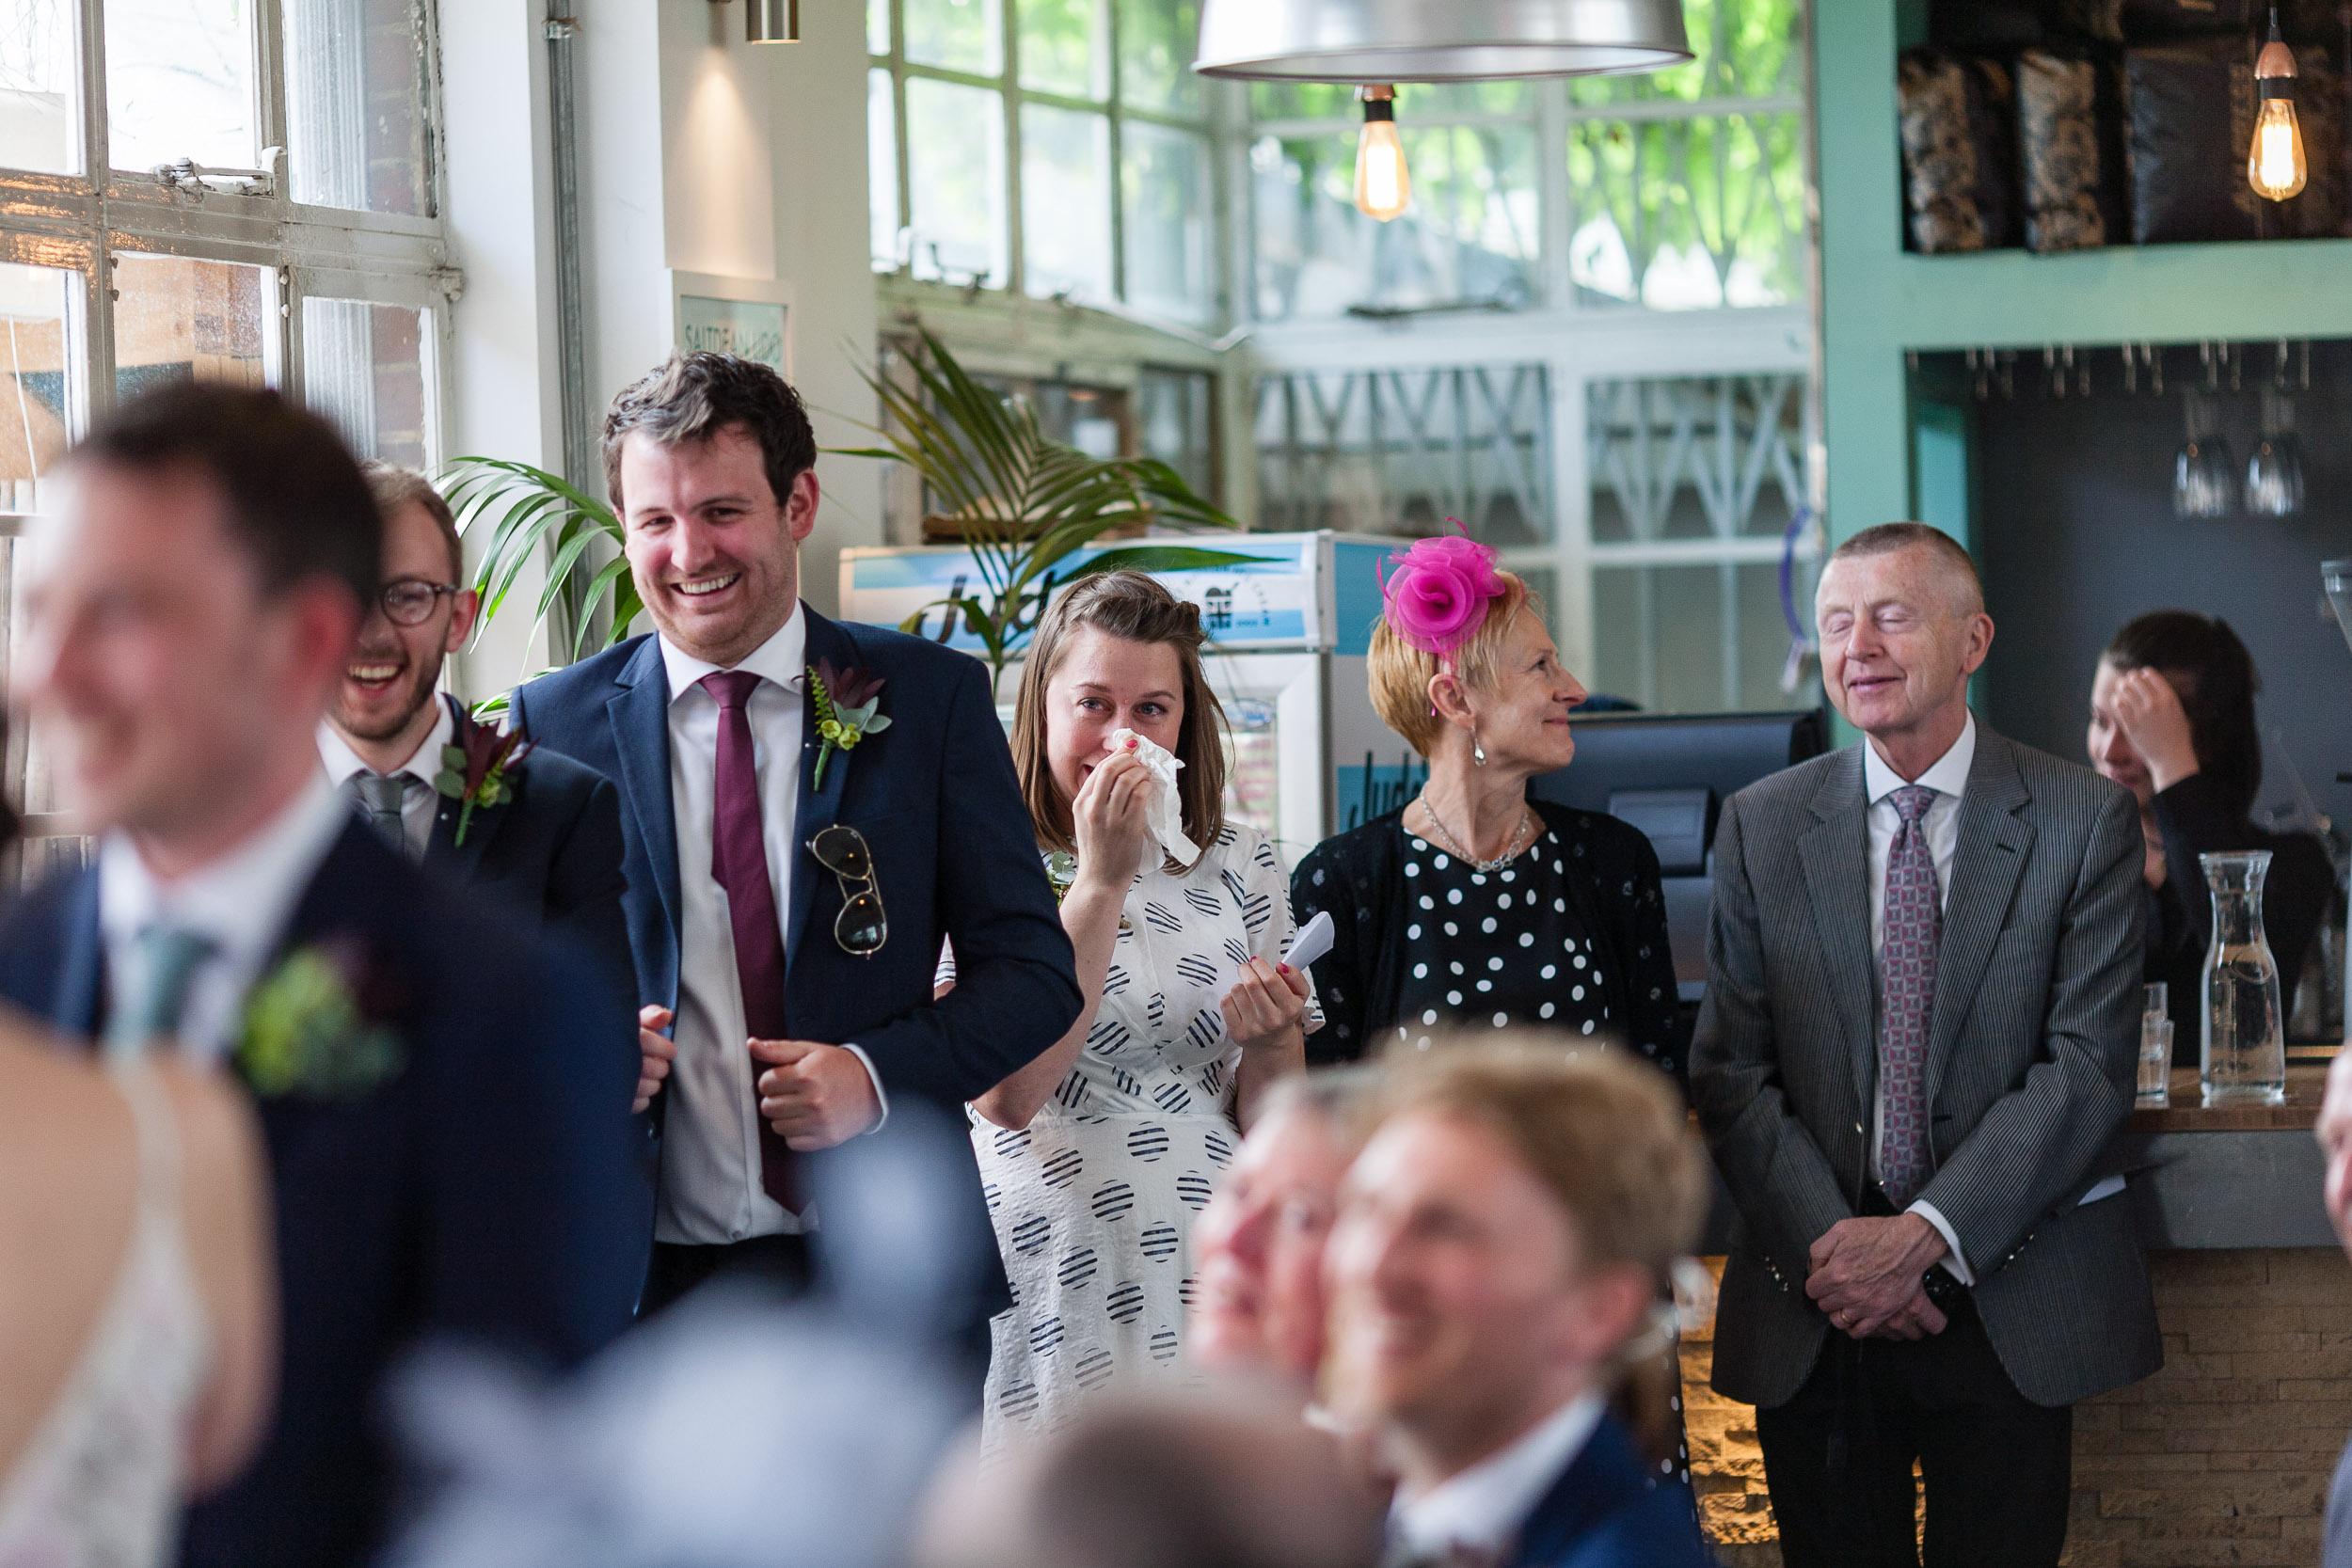 brockwell-lido-brixton-herne-hill-wedding-156.jpg